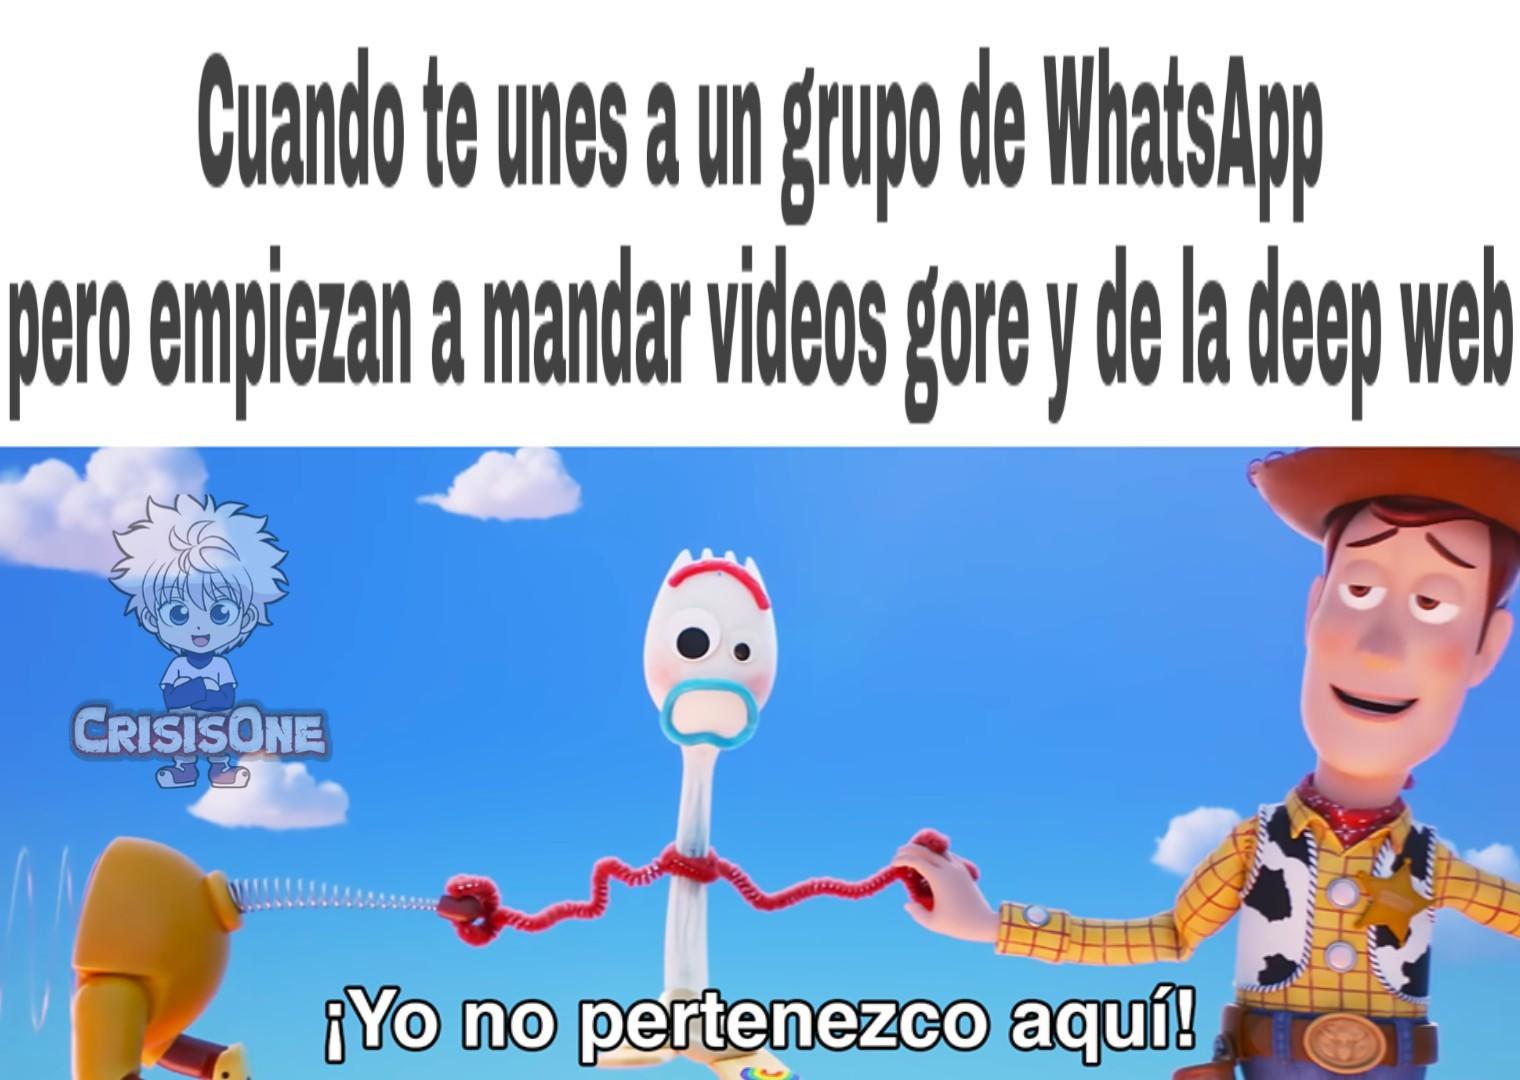 Grupos de WhatsApp - meme